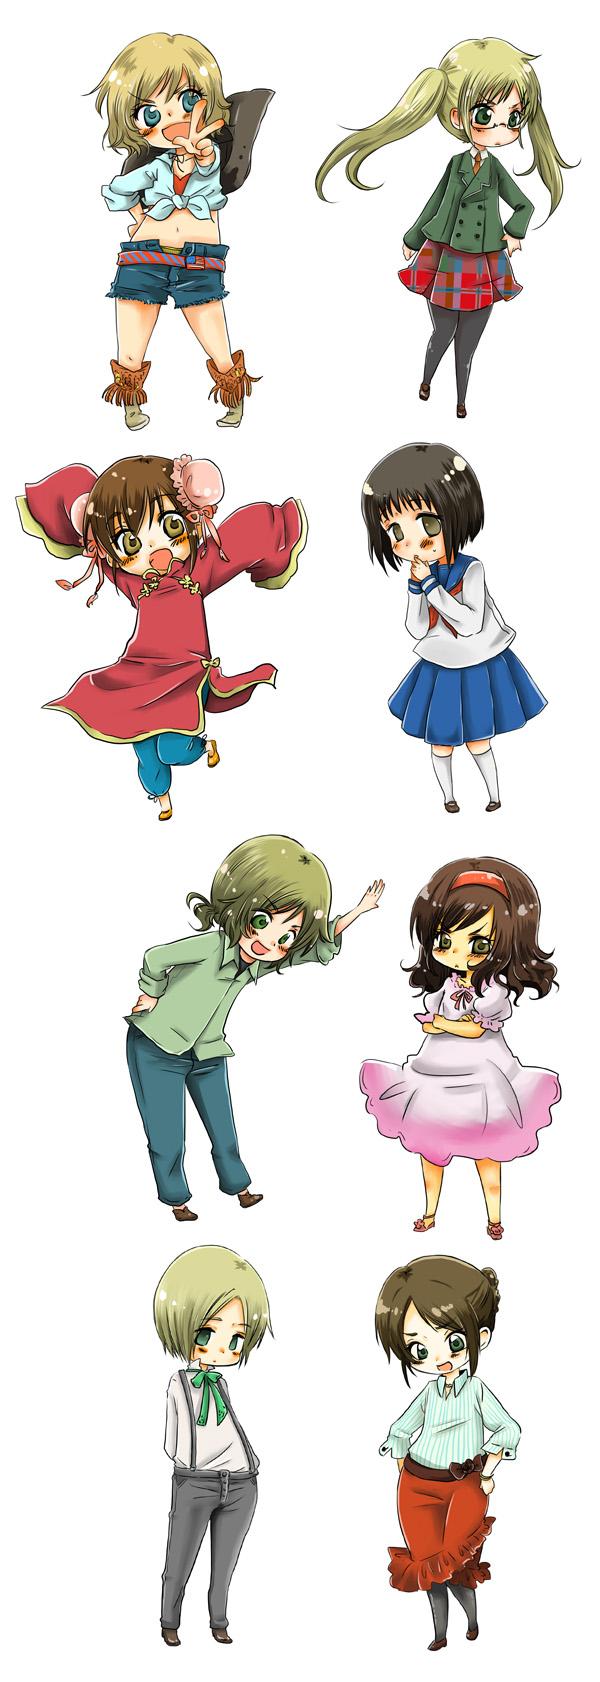 Tags: Anime, Pixiv Id 797896, Axis Powers: Hetalia, Liechtenstein (Male), China (Female), Japan (Female), South Italy (Female), United Kingdom (Female), Spain (Female), United States (Female), Hungary (Male), Nyotalia, Pixiv